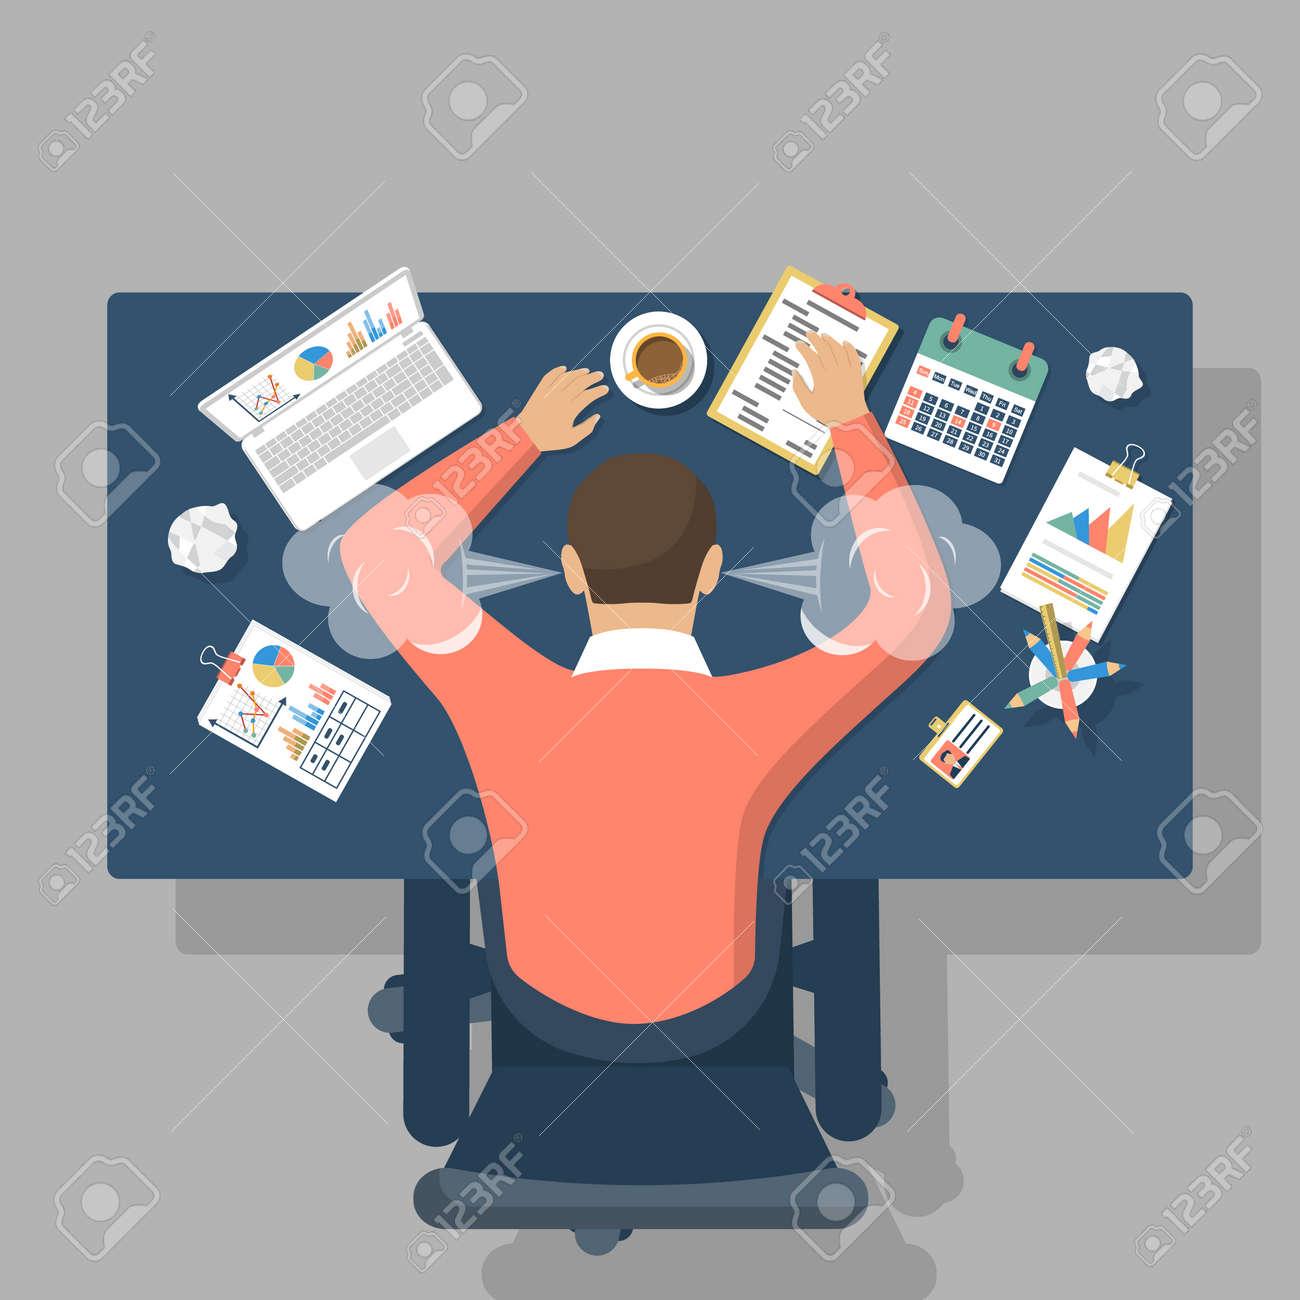 man at desk overwhelmed hard work stress at work fatigue at work